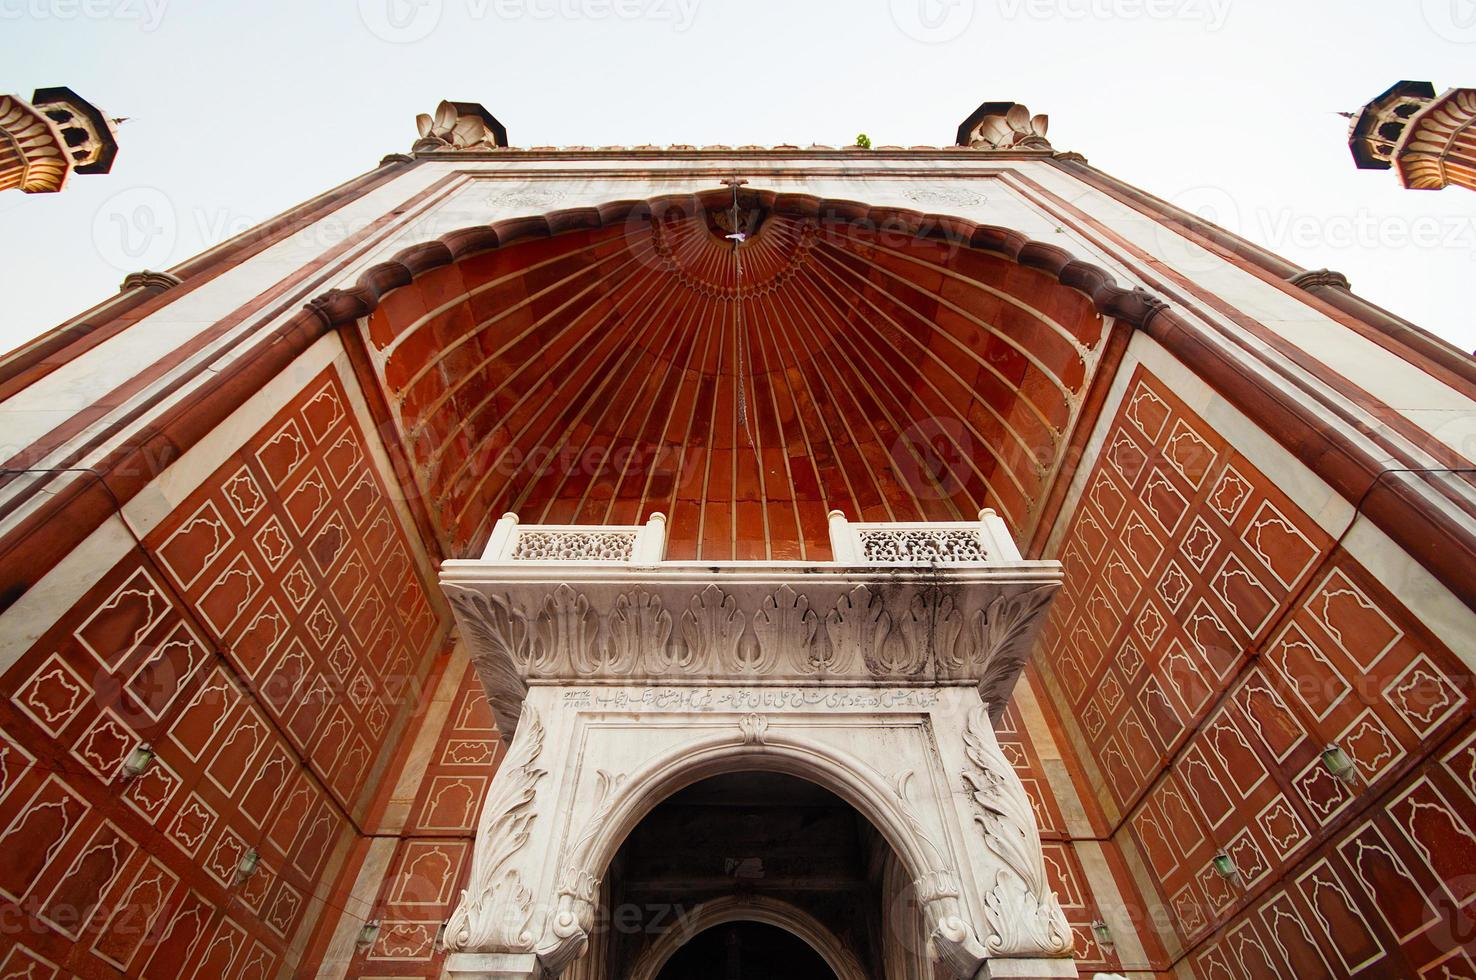 mezquita jama masjid, antigua delhi, india foto